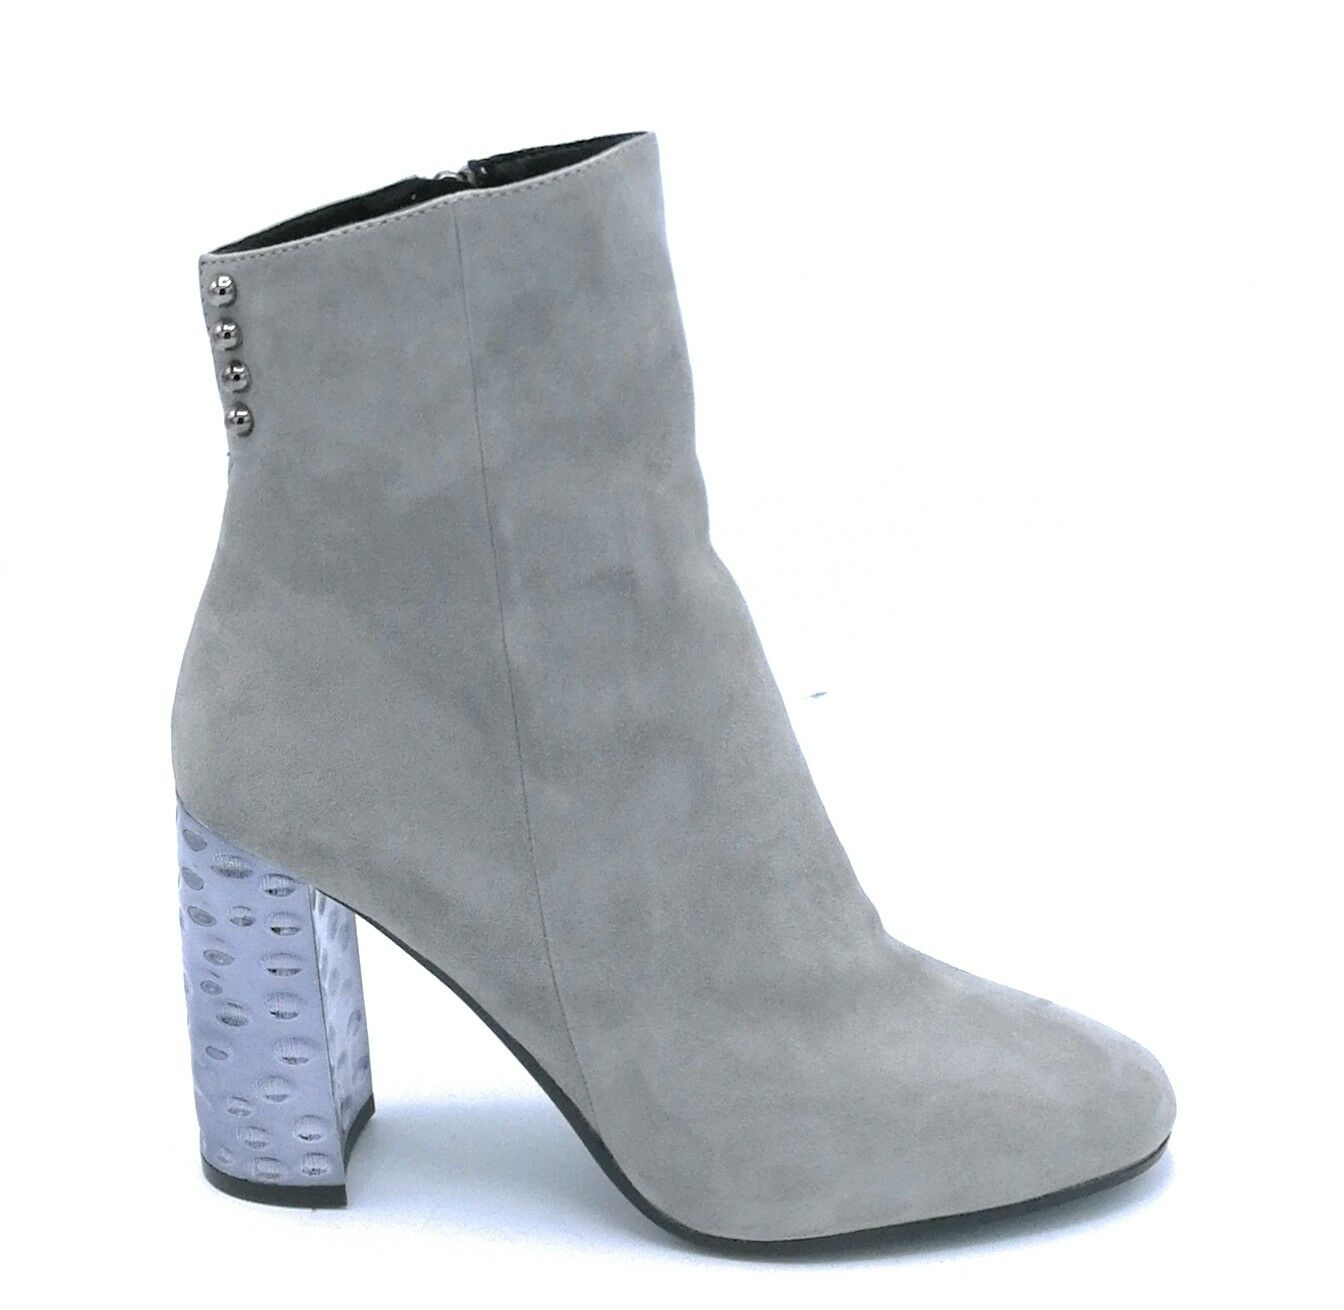 Bruno Premi U1401 Ankle Boot Suede Grey Zipper Studs Heel 9cm